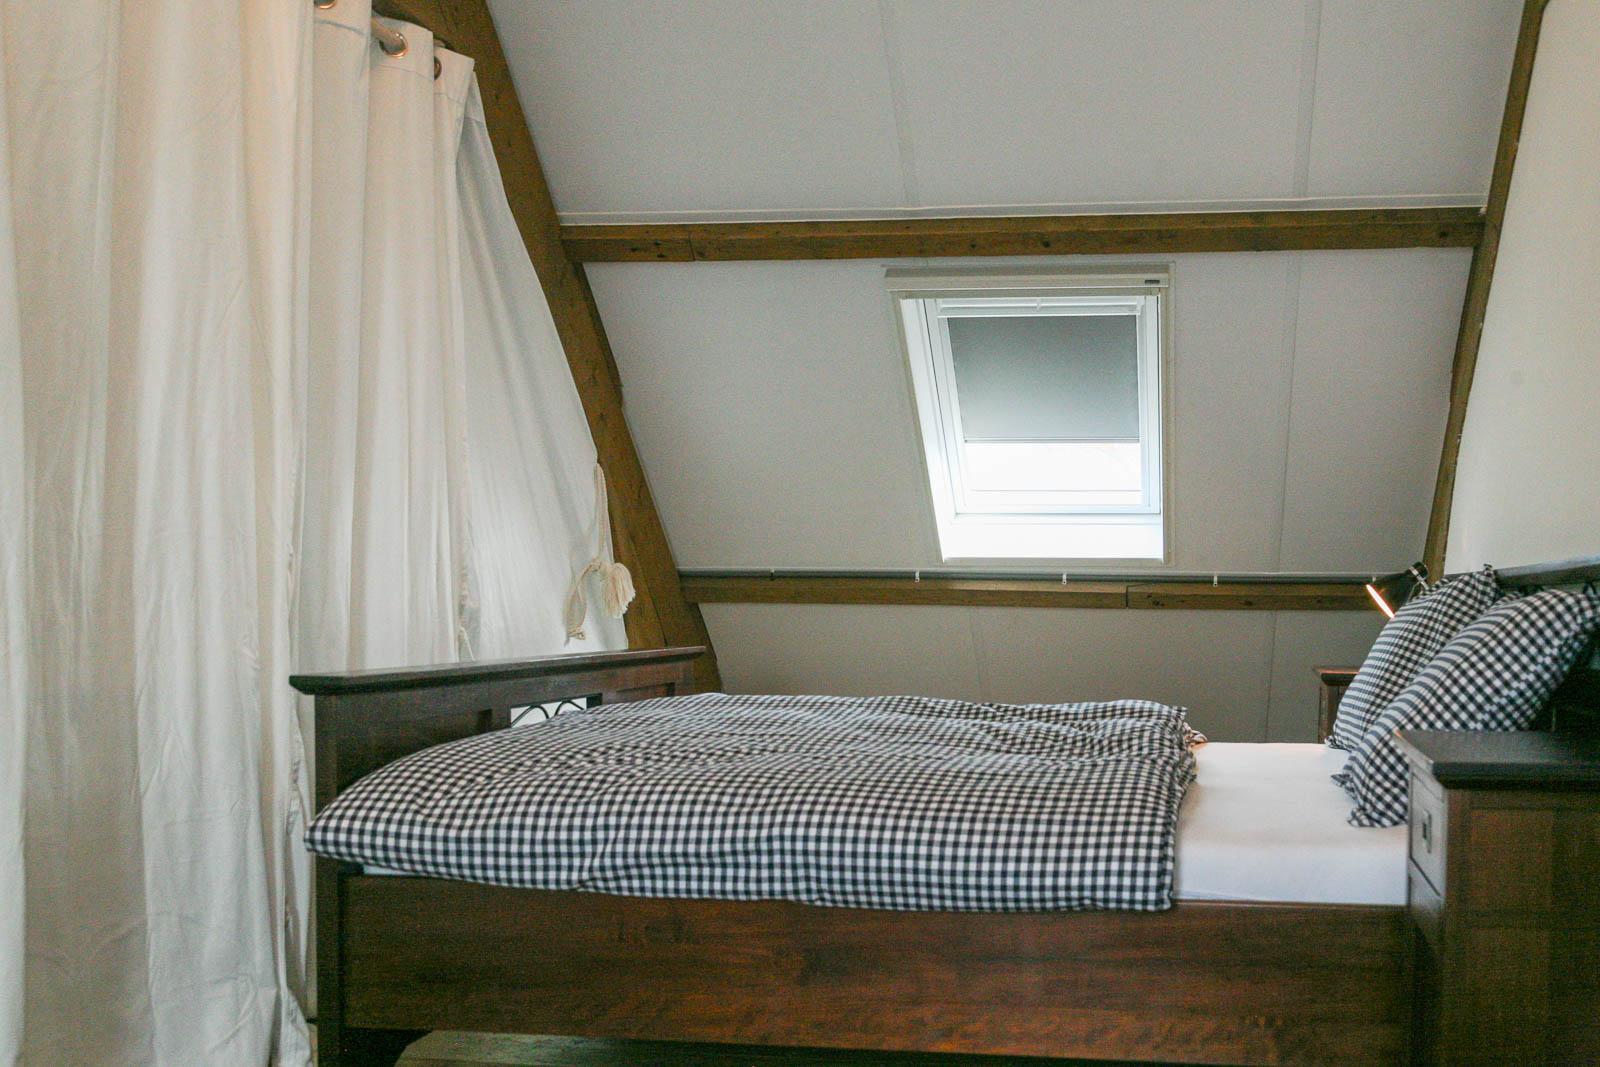 Hillegondahoeve-De Oude Stal-1448